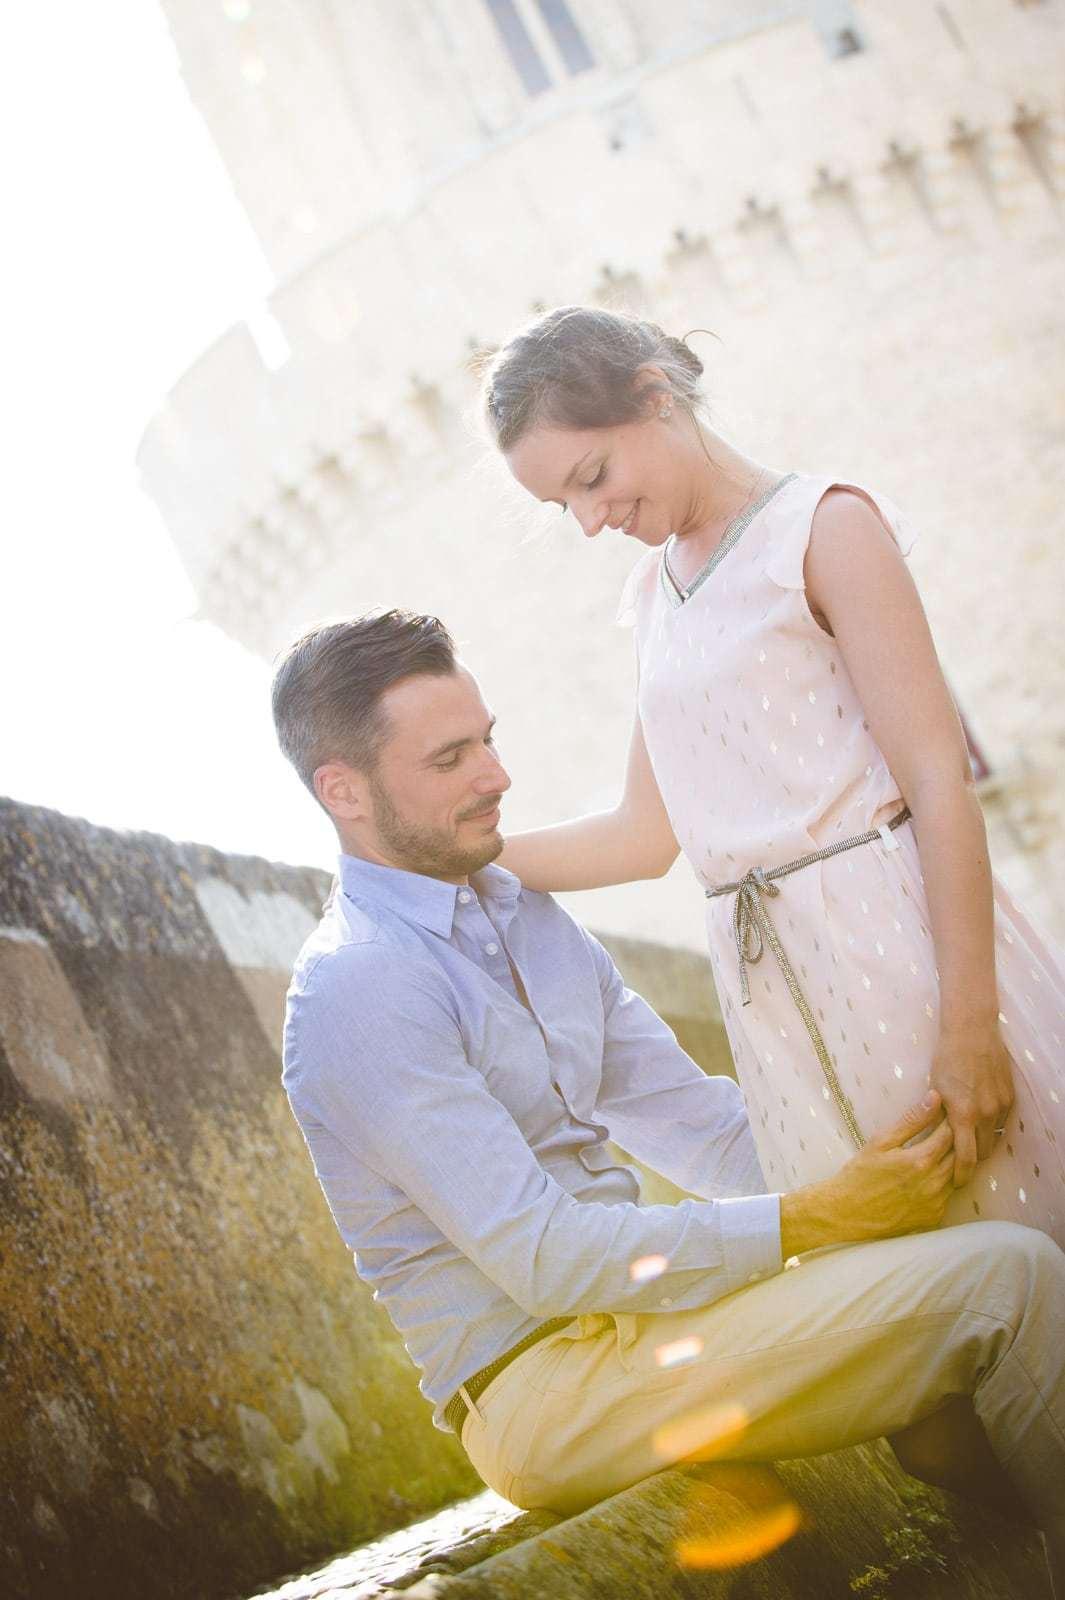 Photographe-la-rochelle-ile-de-re-charente-maritime-instants-cliches-mariage-drone-corporate-7